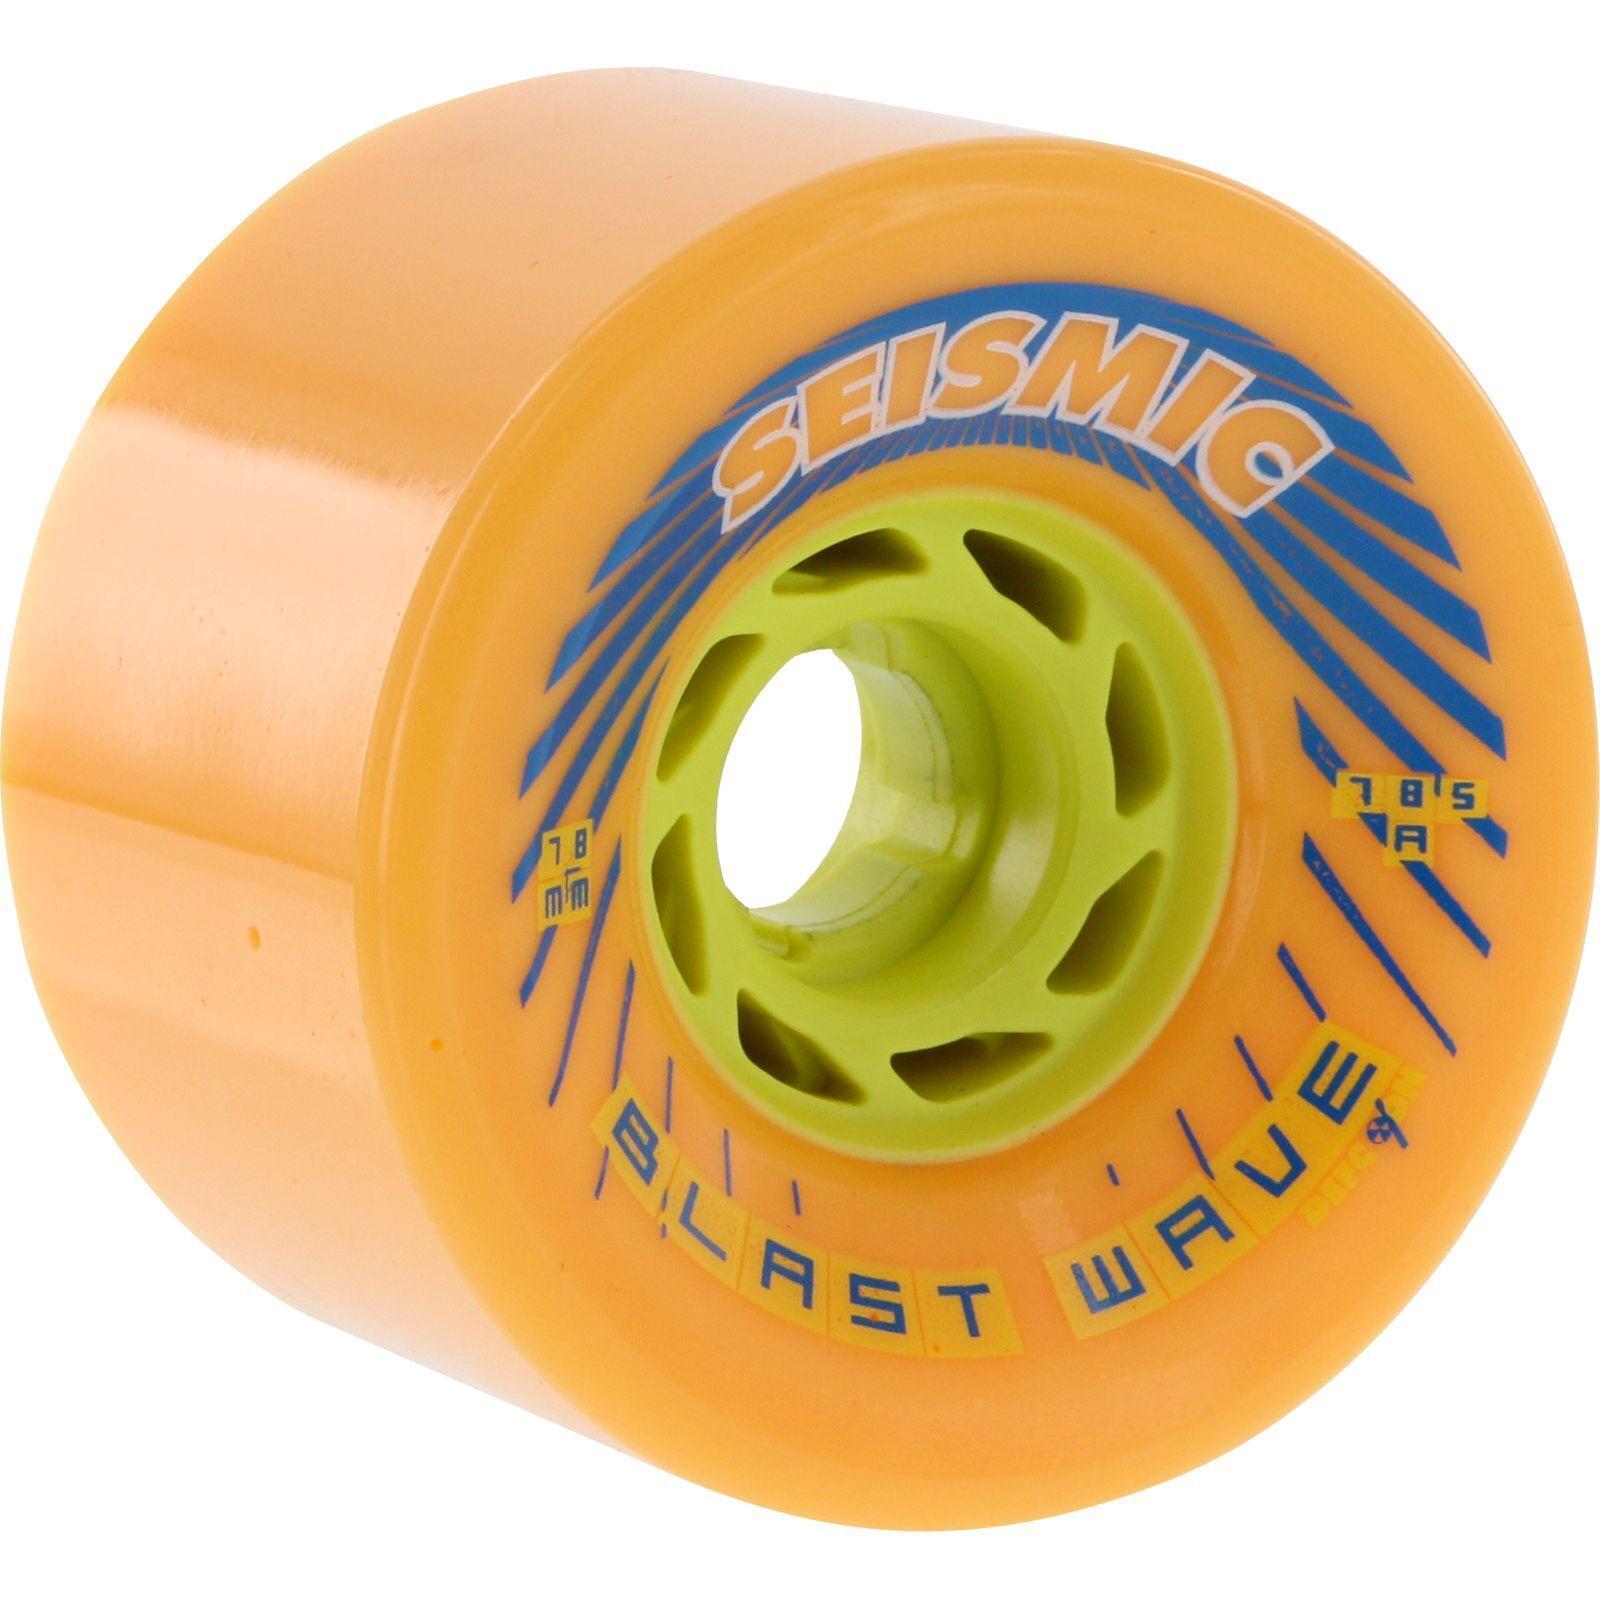 Seismic Blast Wave 78mm 78.5a Mango Defcon Longboard Wheels (Set of 4)